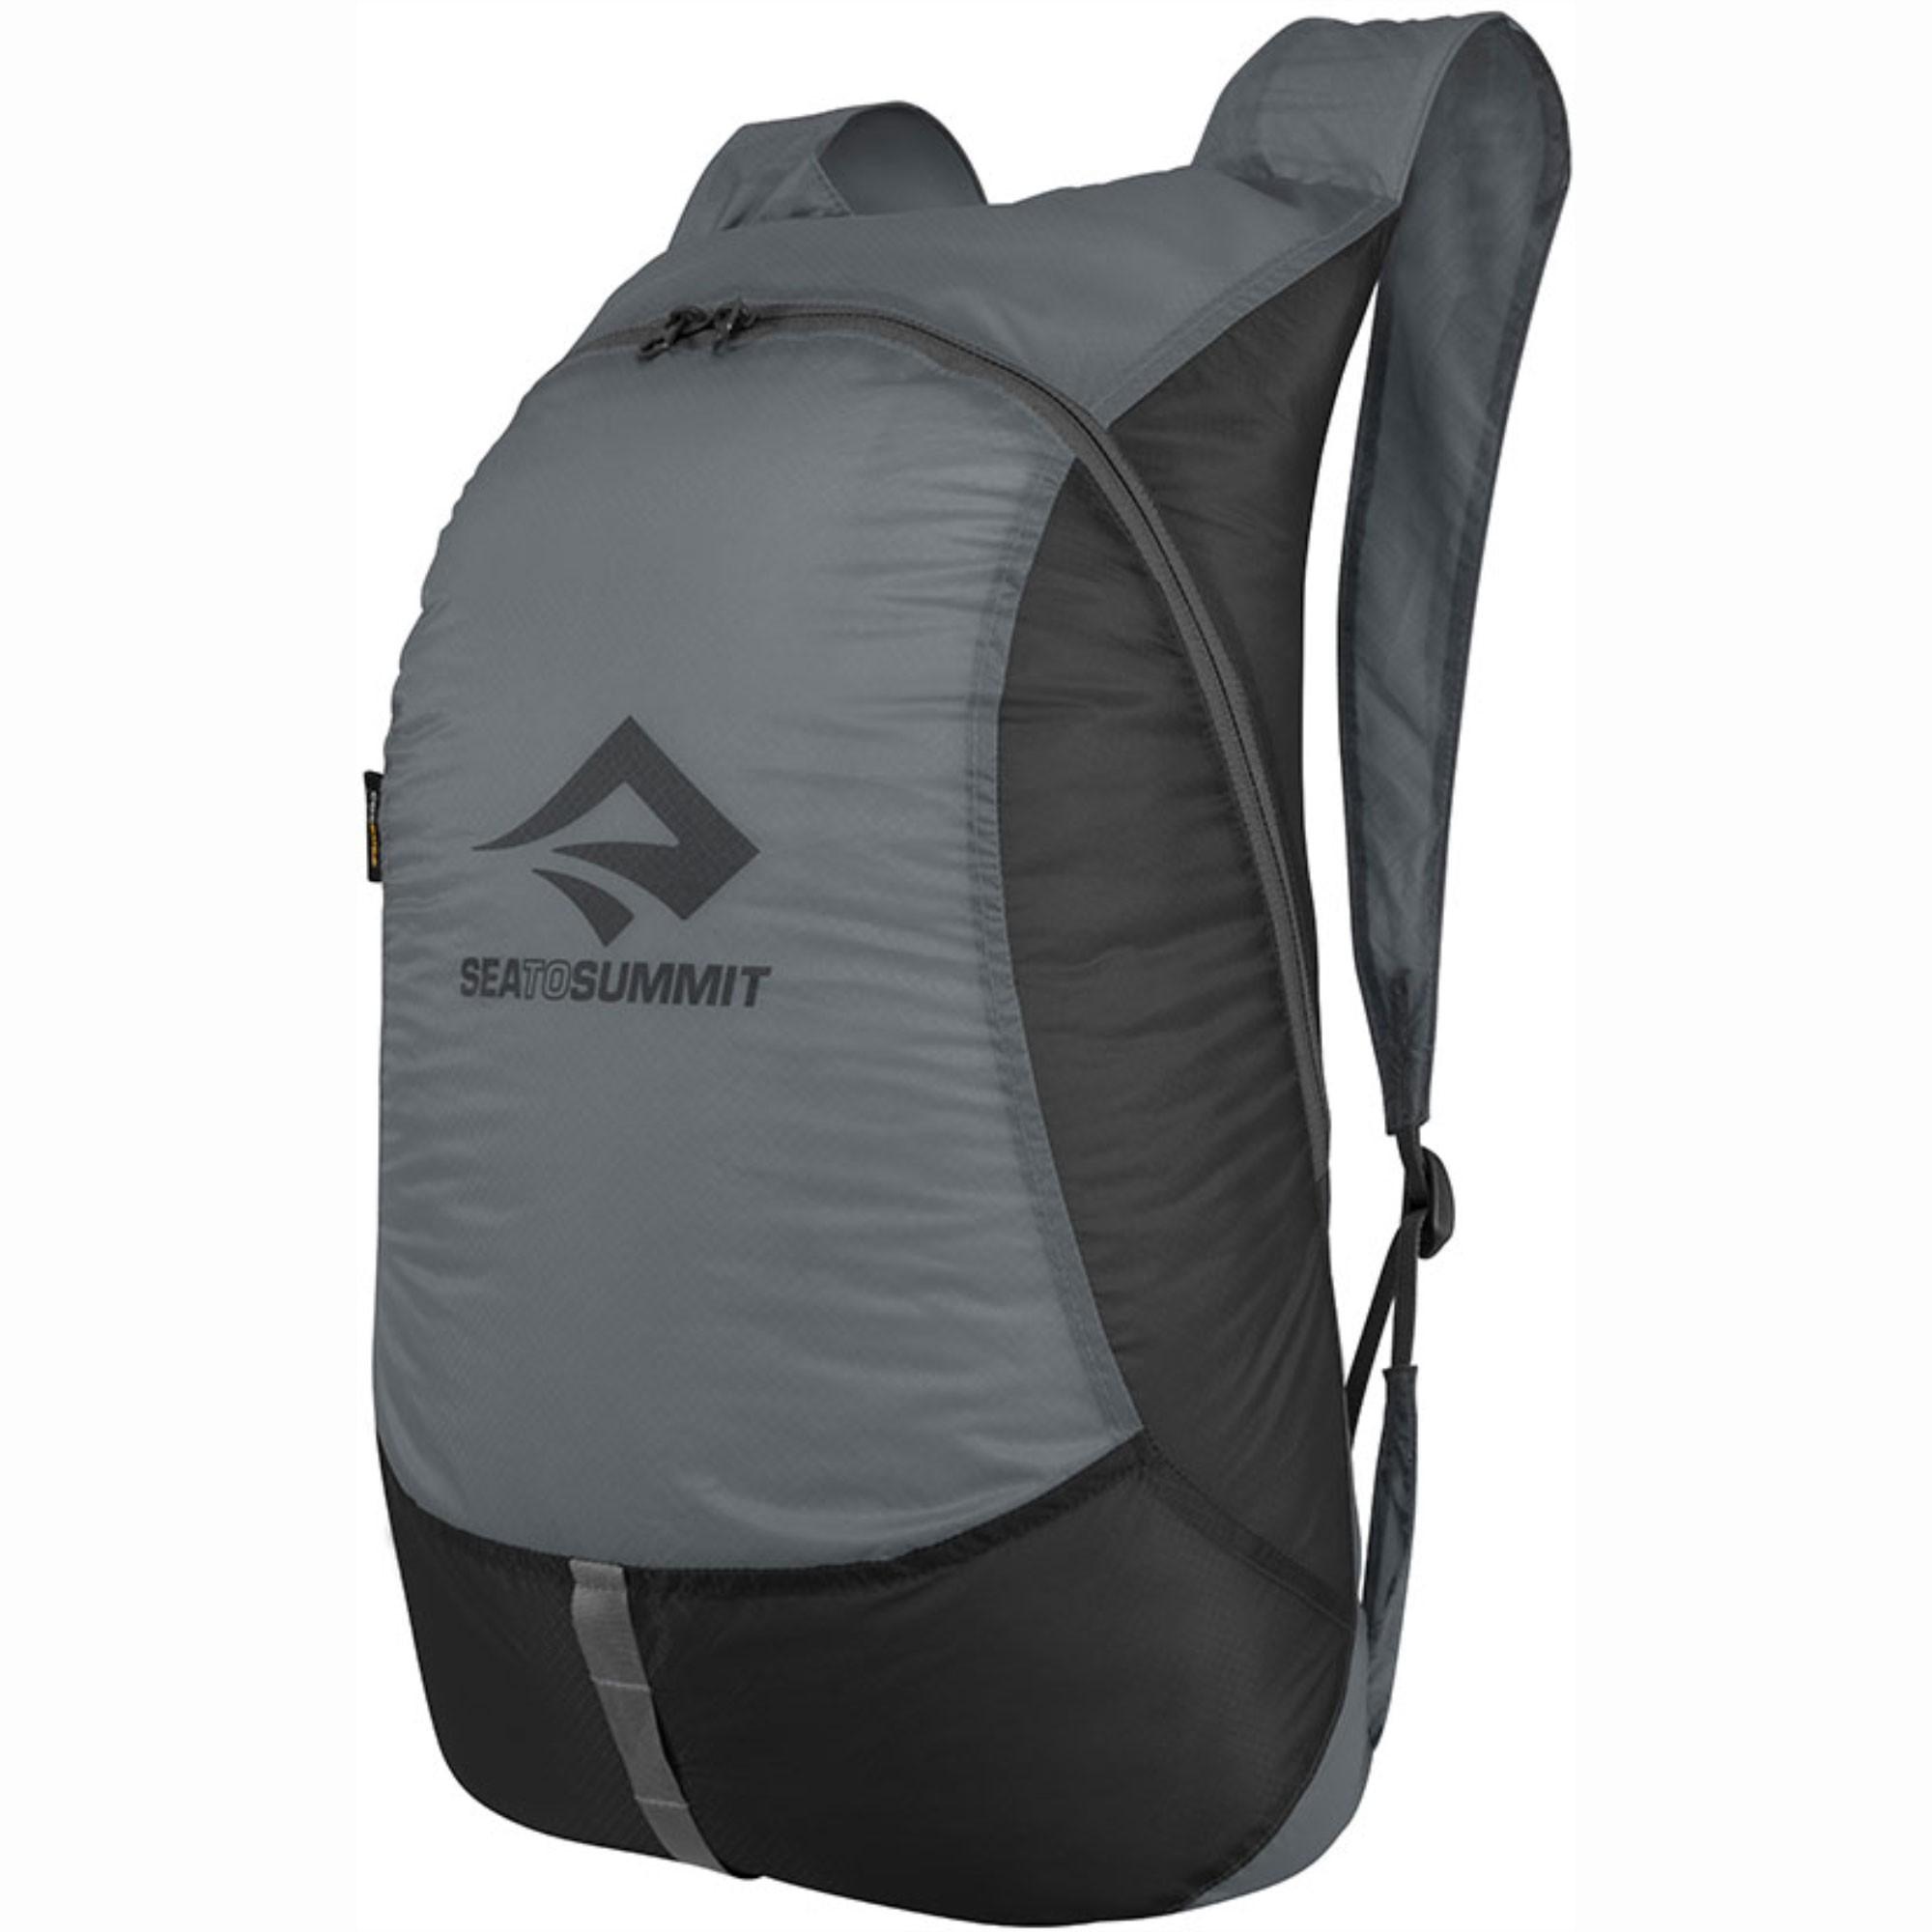 Sea to Summit Ultra-Sil Daypack - Black